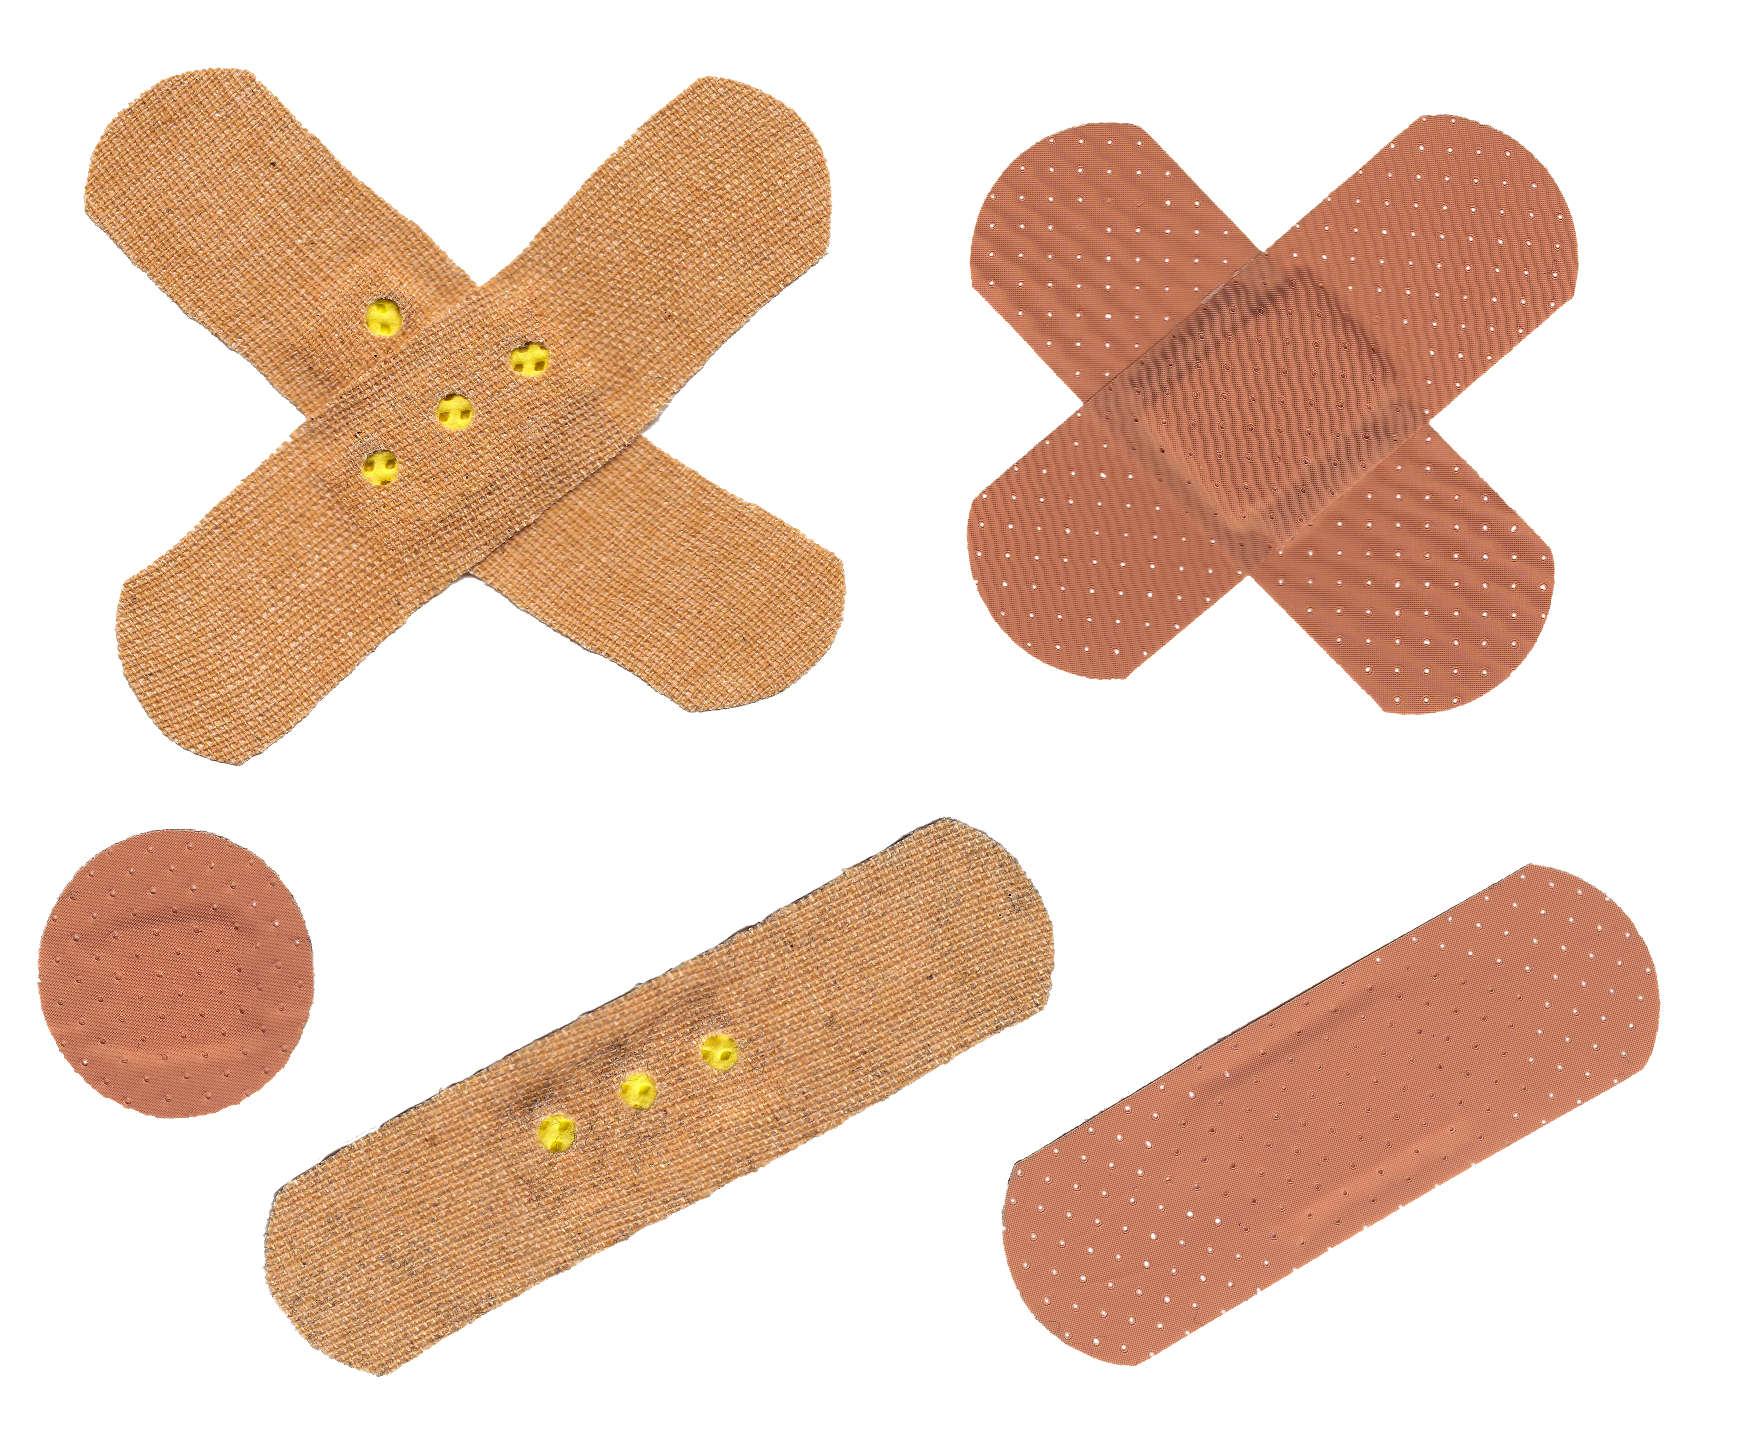 band-aid-cover.jpg